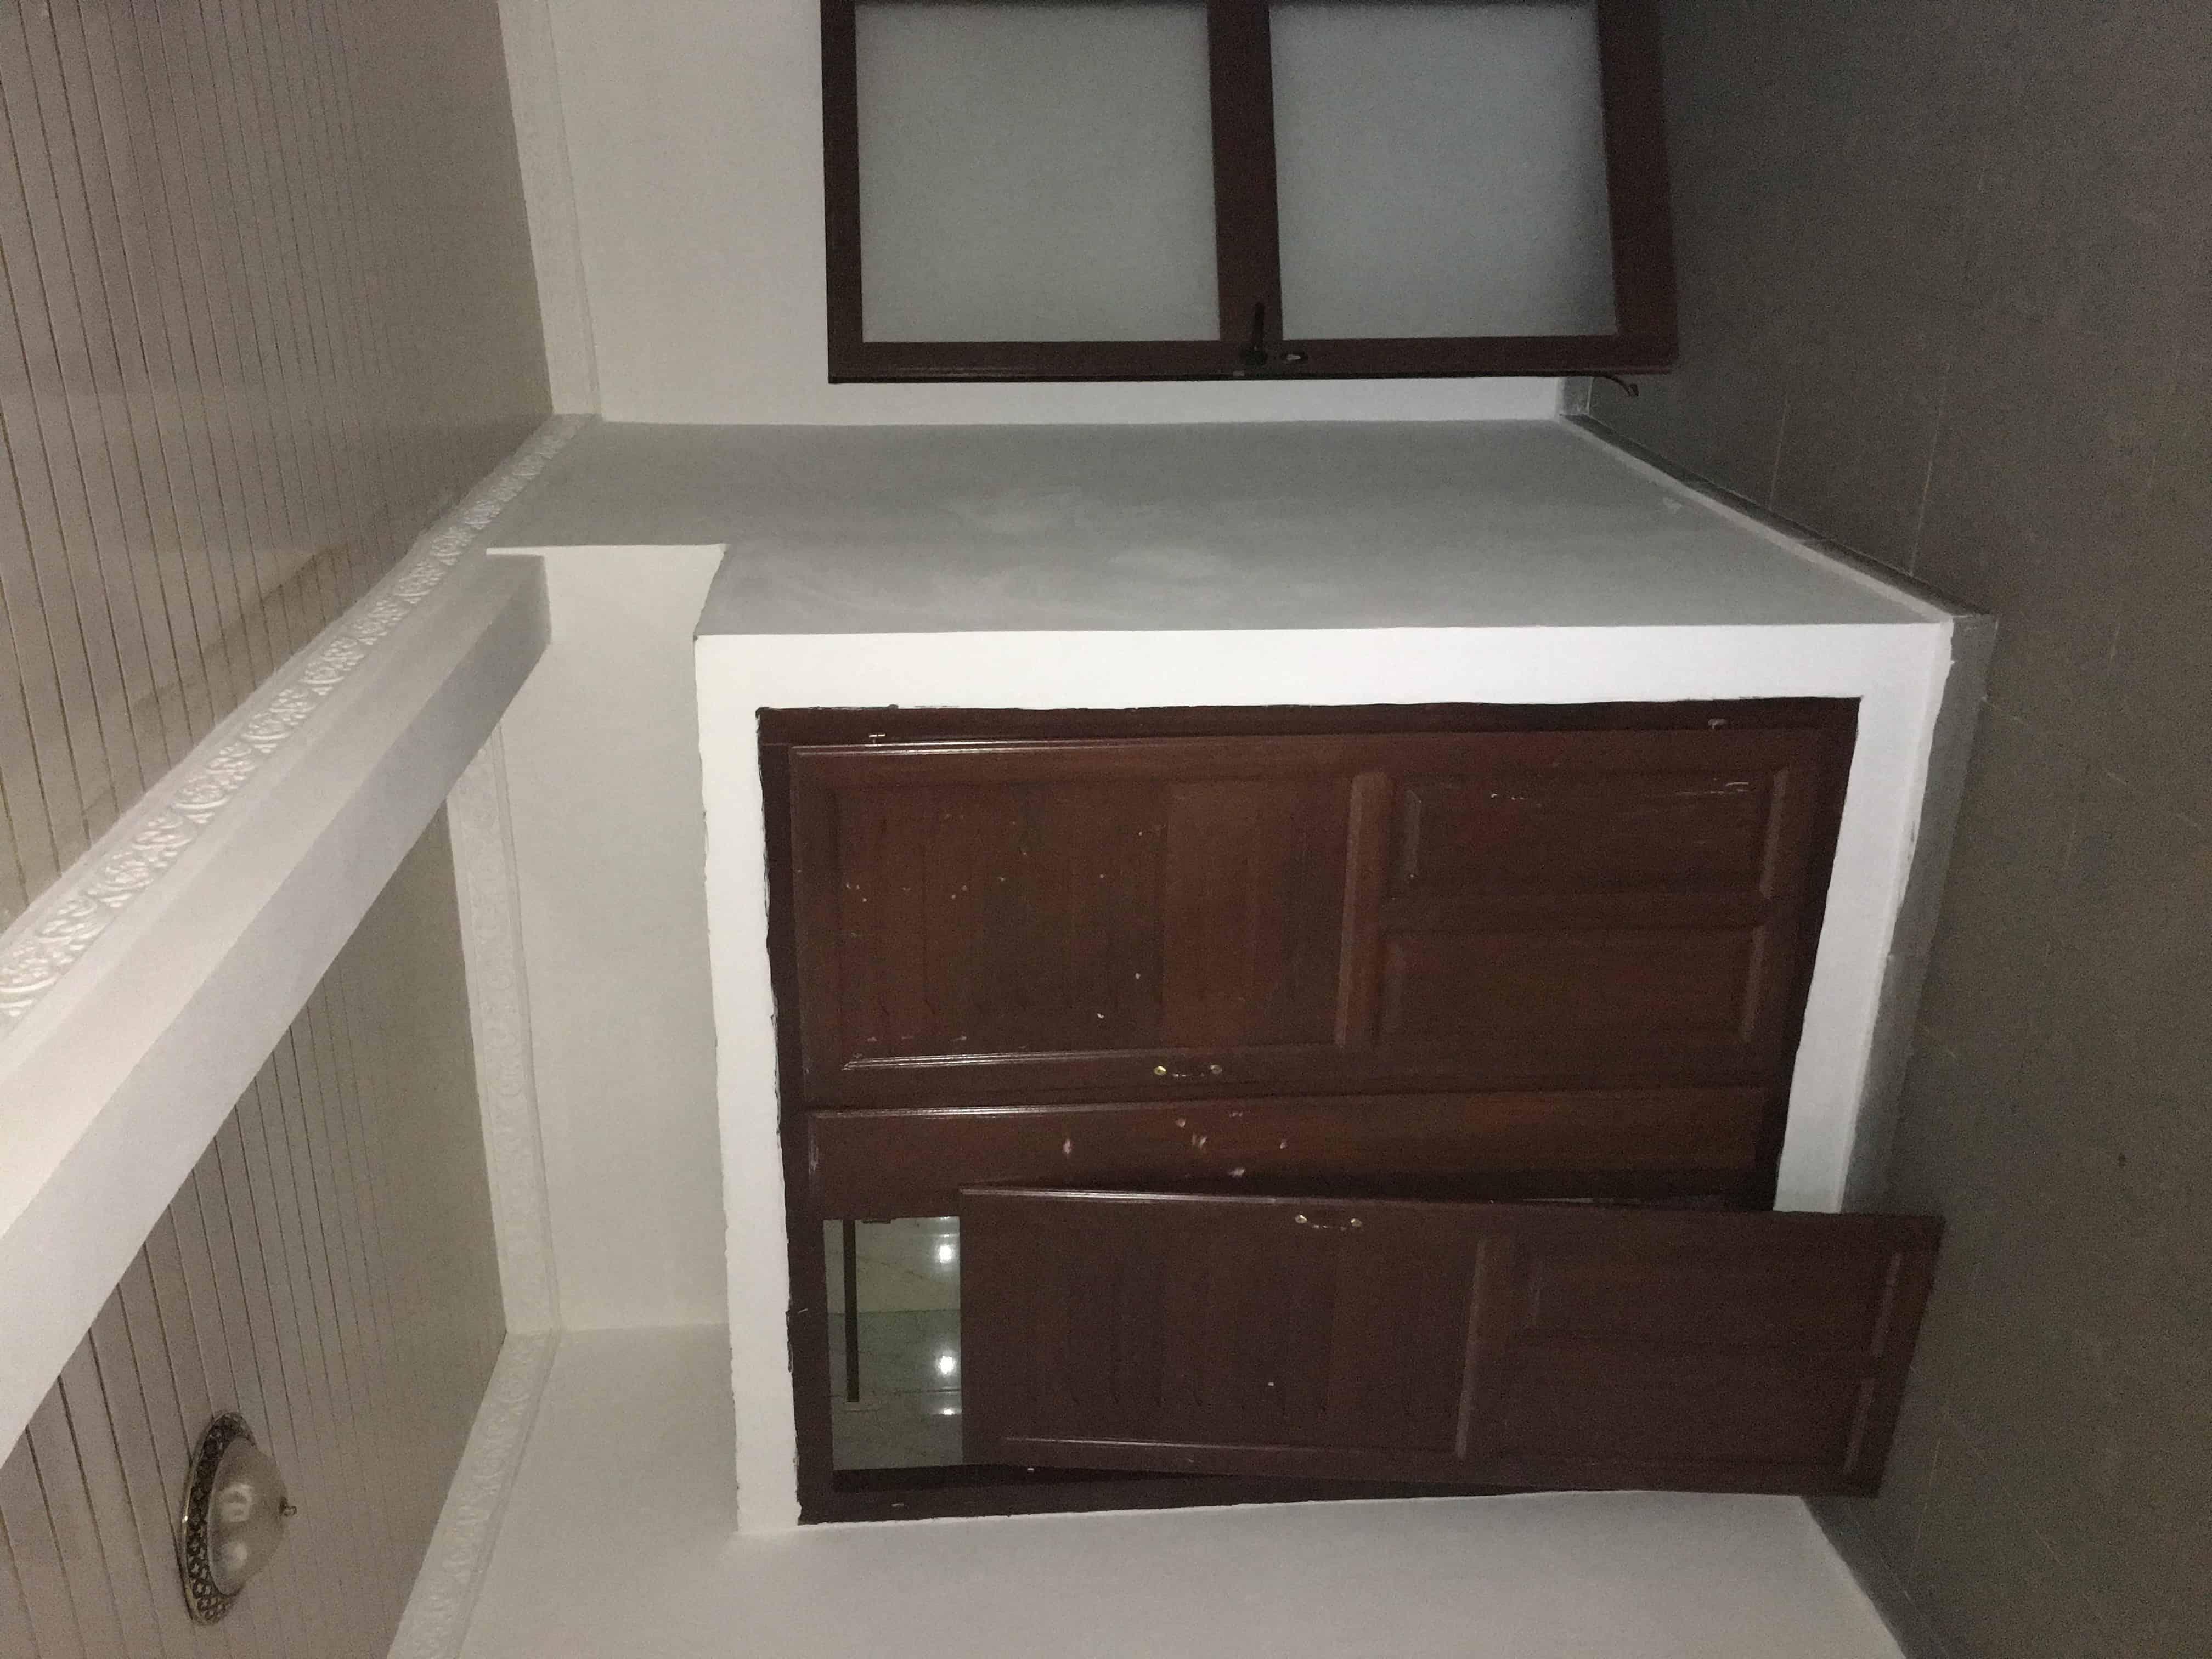 Apartment to rent - Yaoundé, Mfandena, Titi garage - 1 living room(s), 2 bedroom(s), 1 bathroom(s) - 175 000 FCFA / month